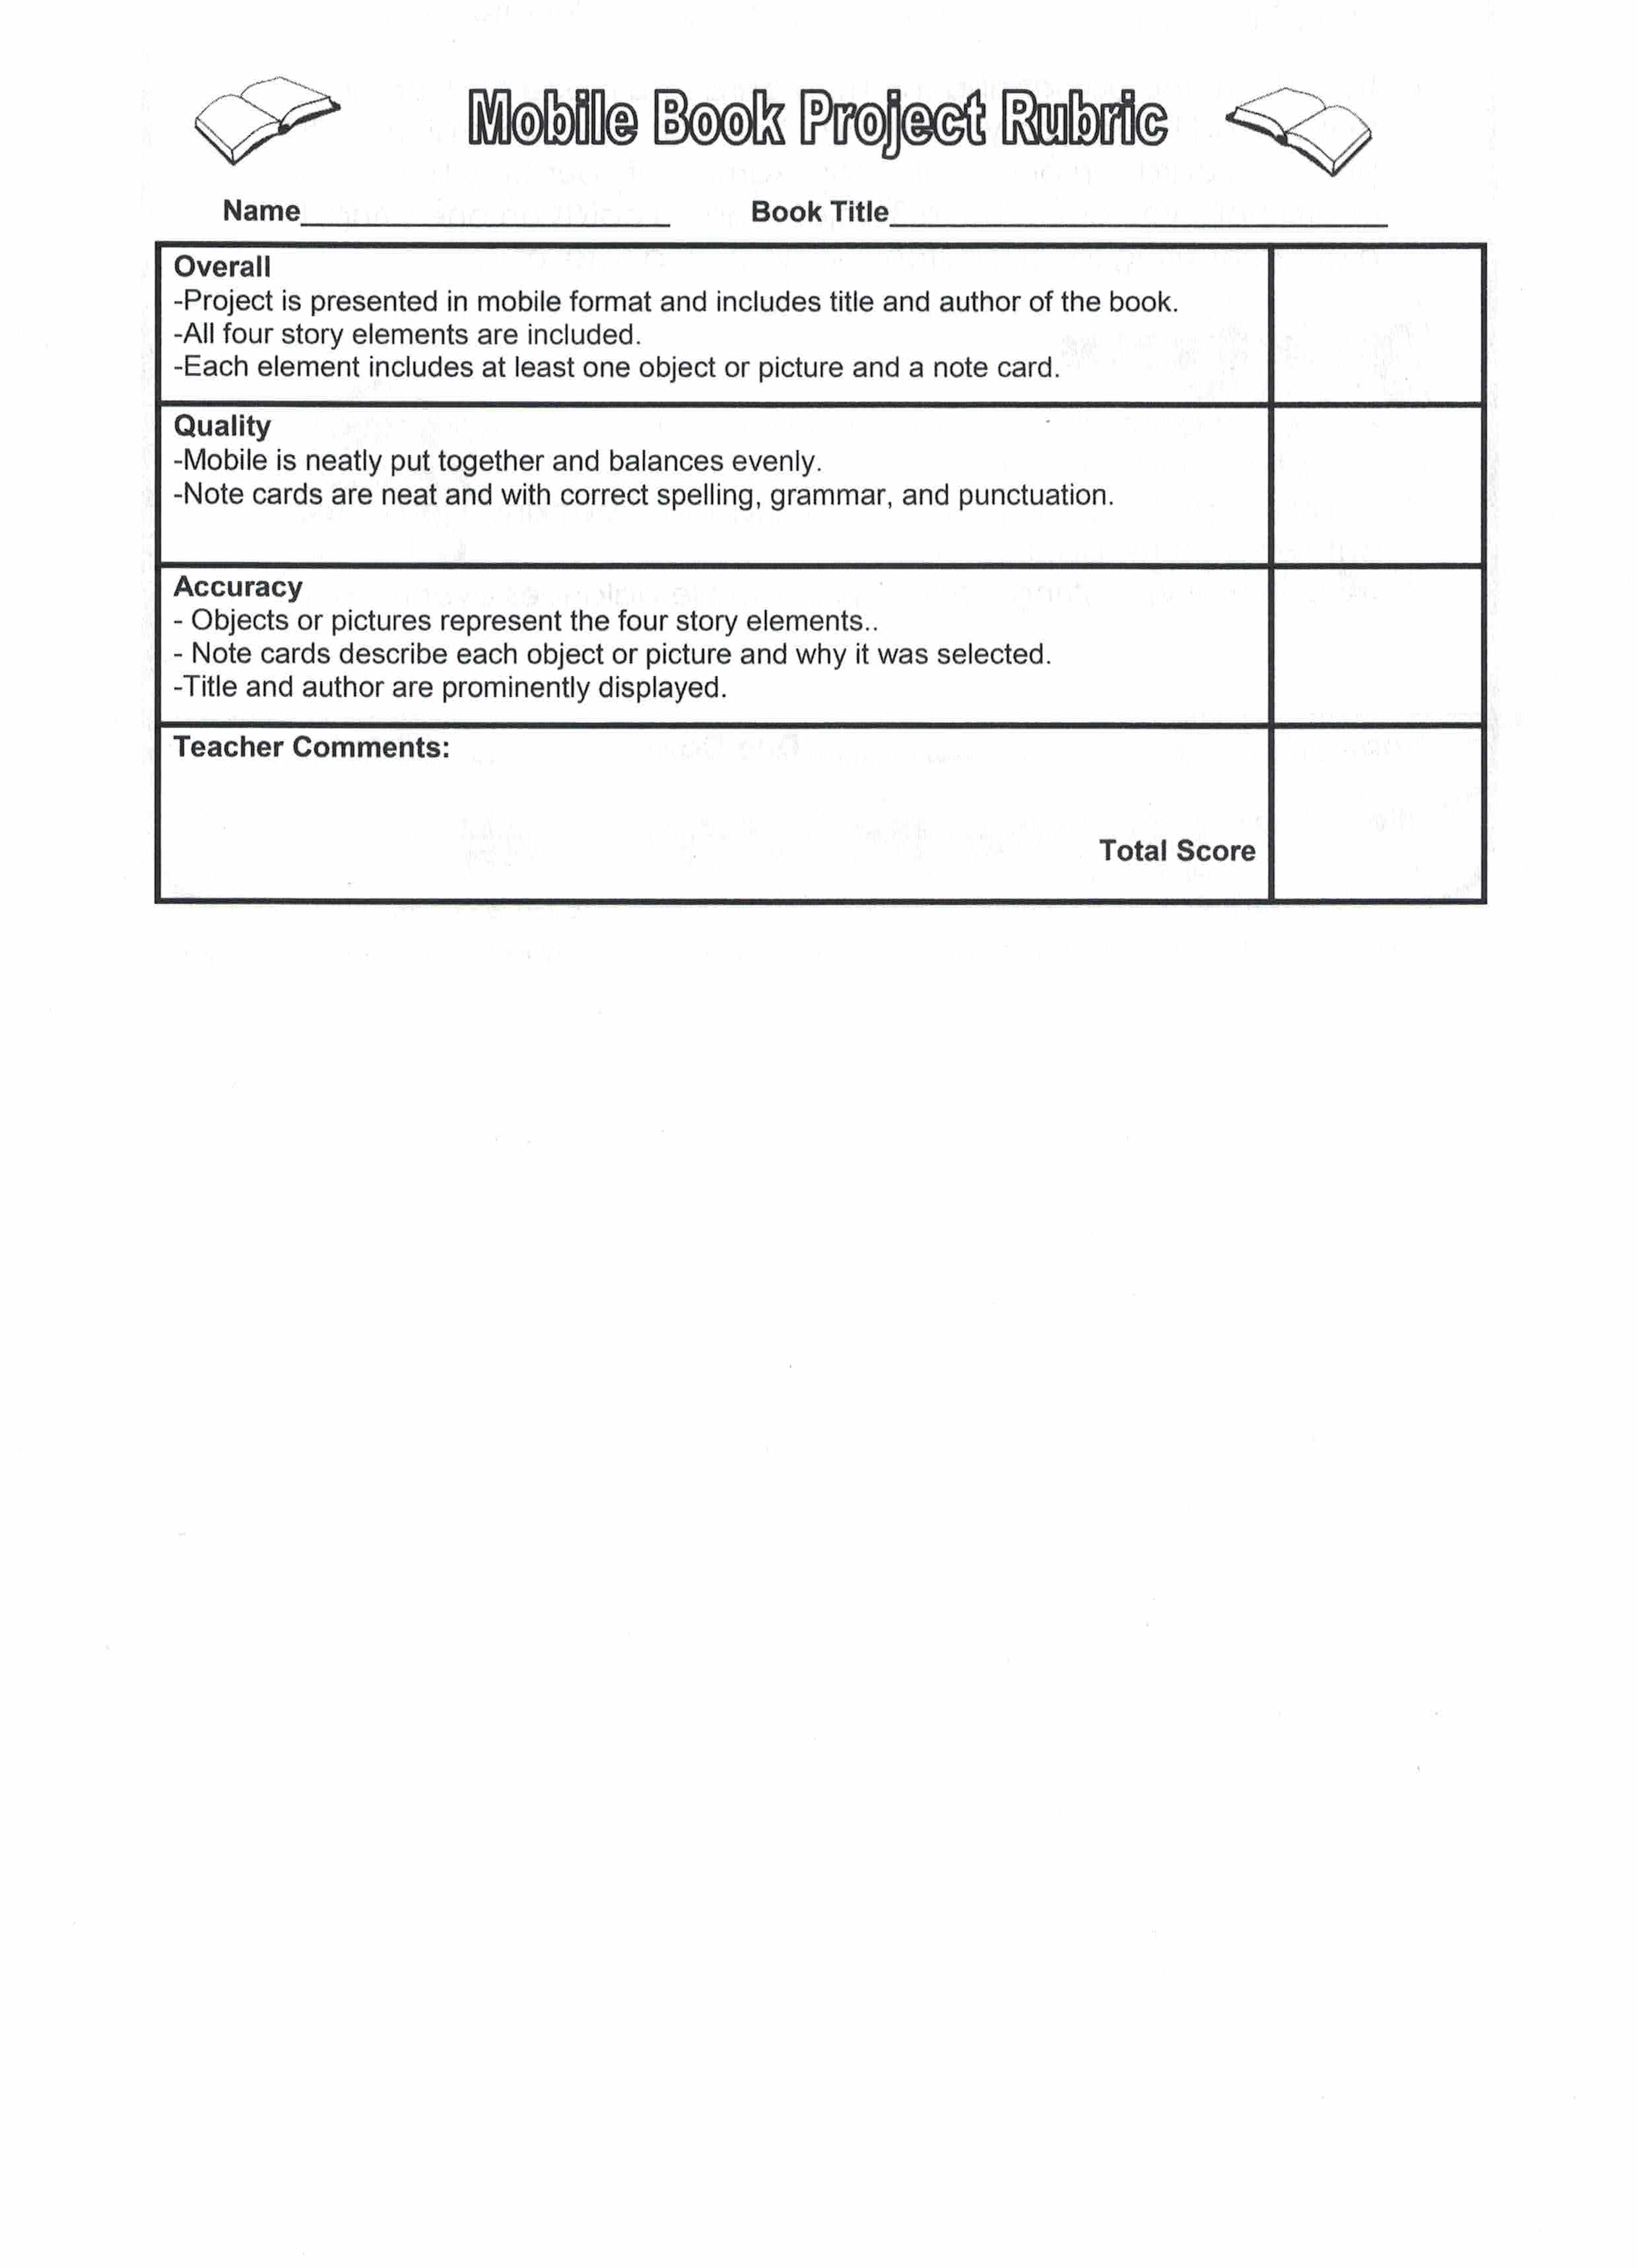 Bowling For Columbine Response Essay Free Printable